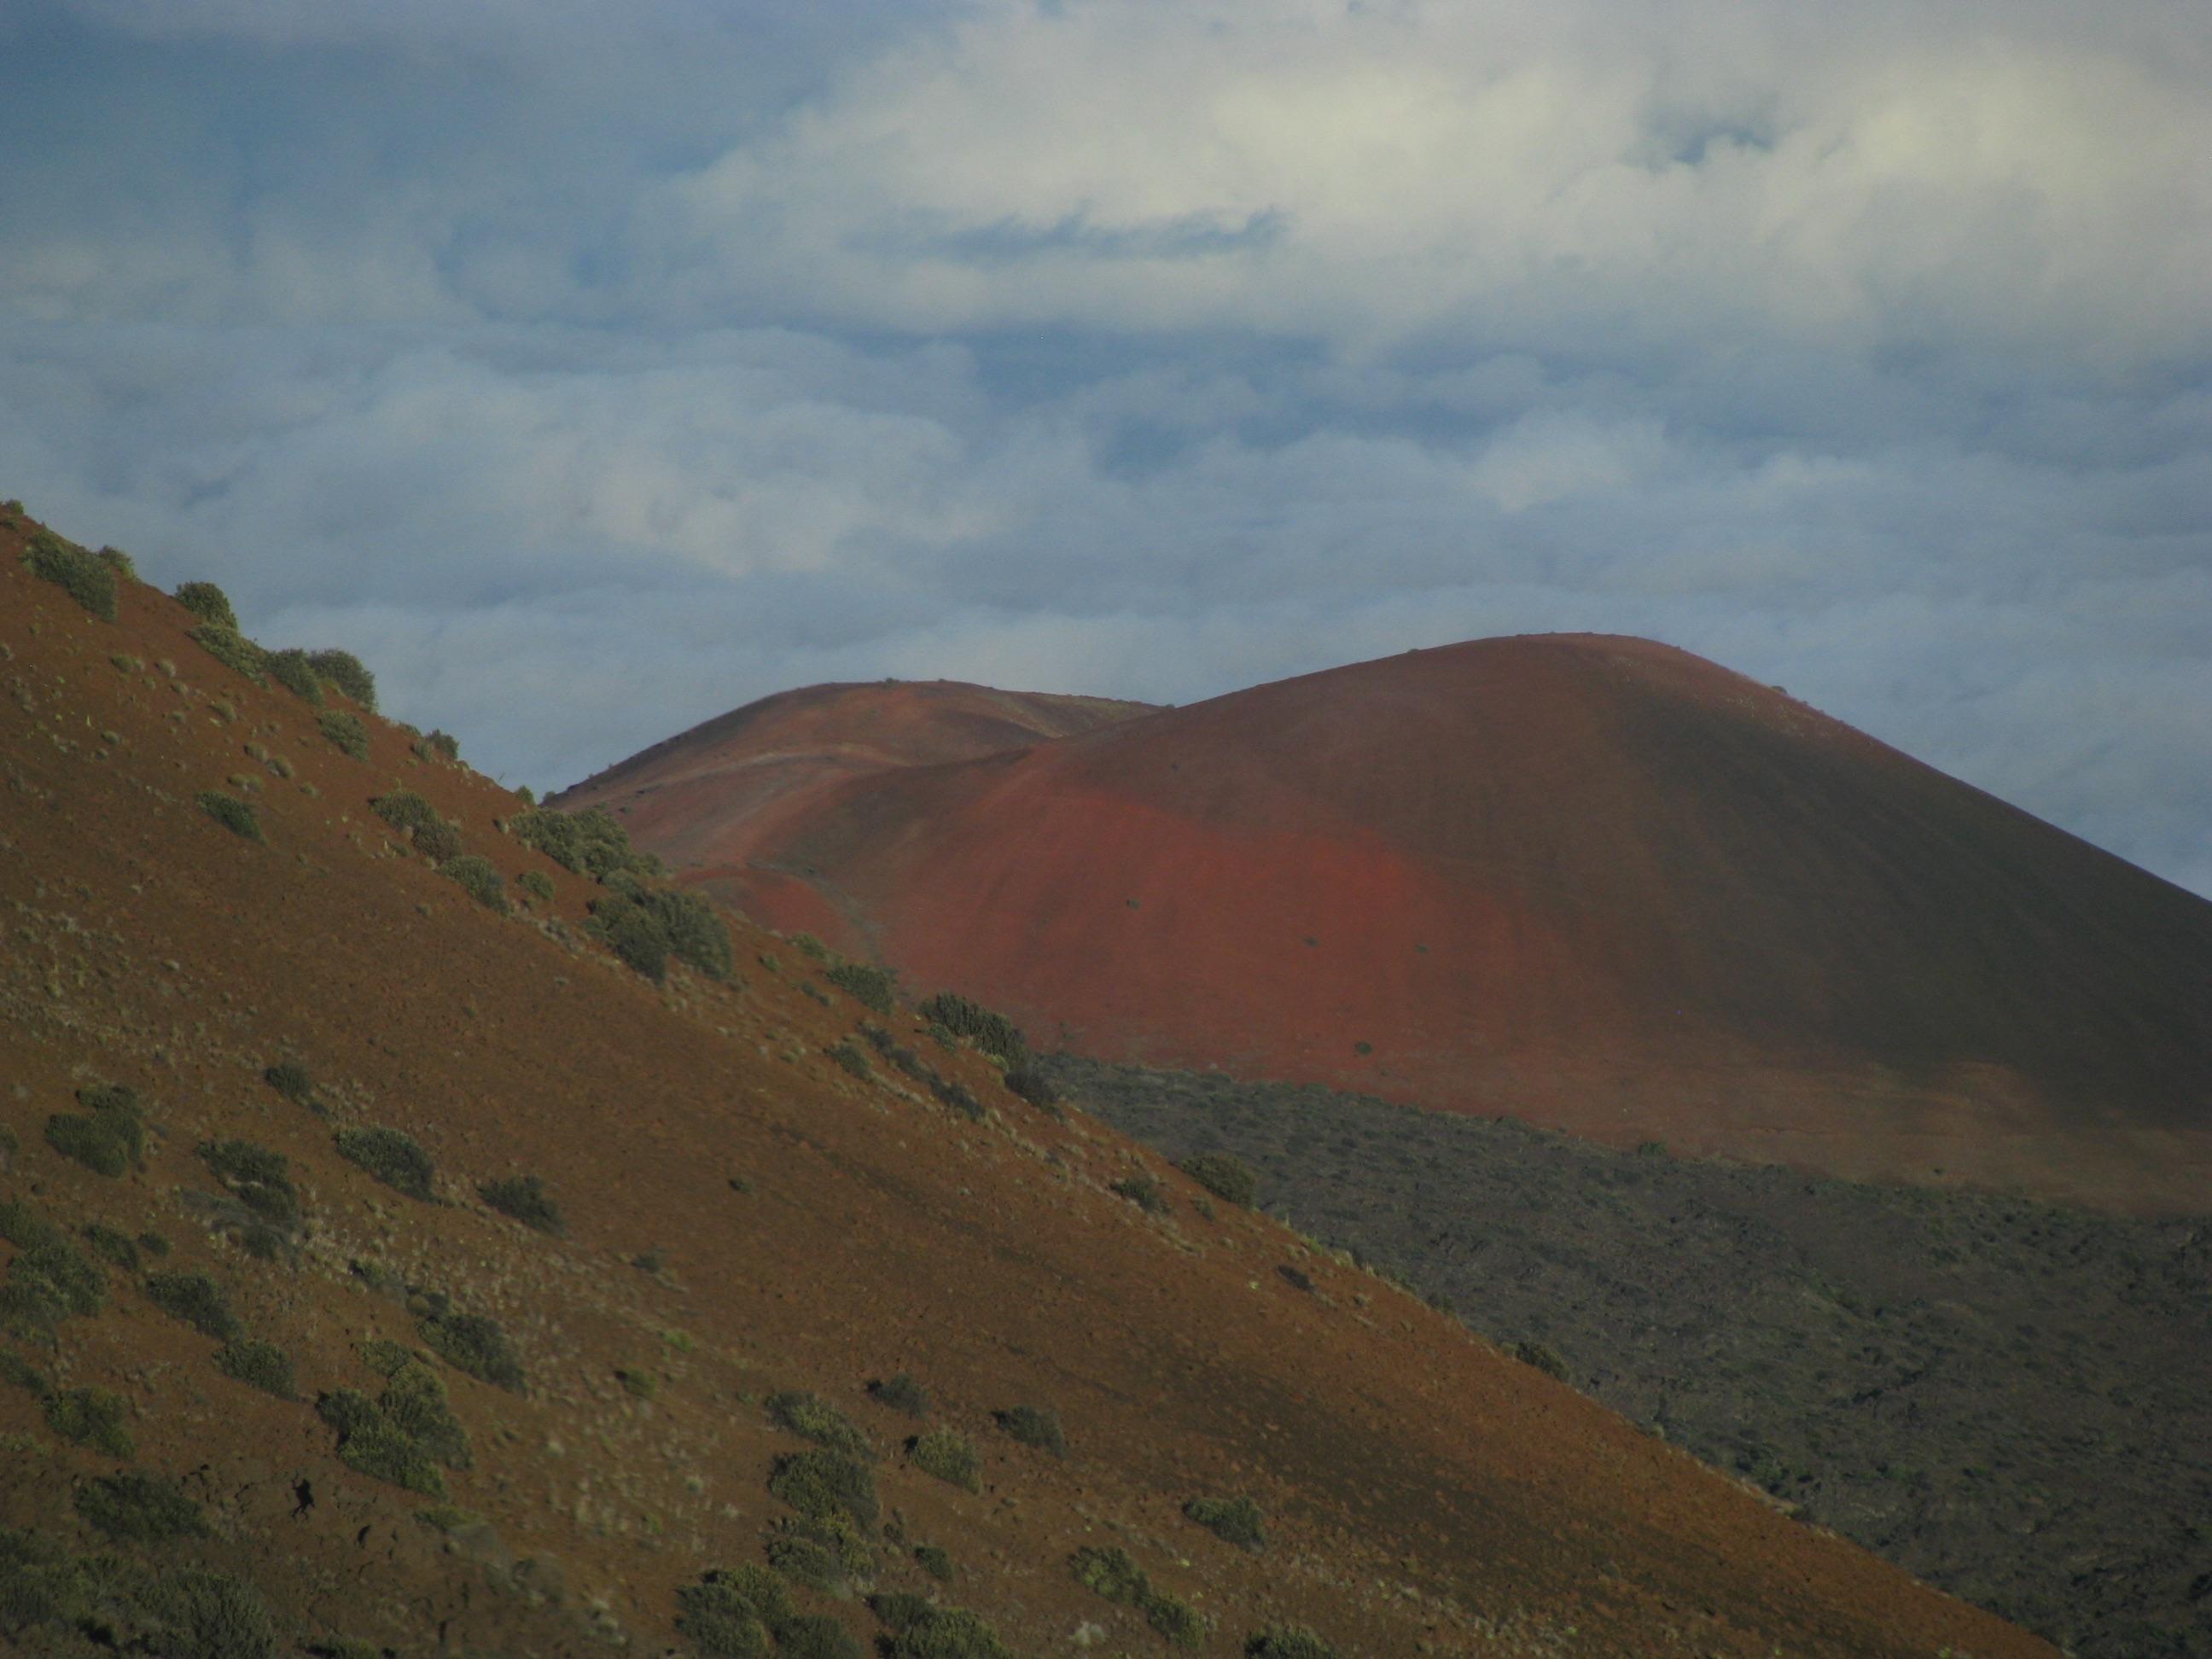 Mauna Kea Observatories Volcano closeup